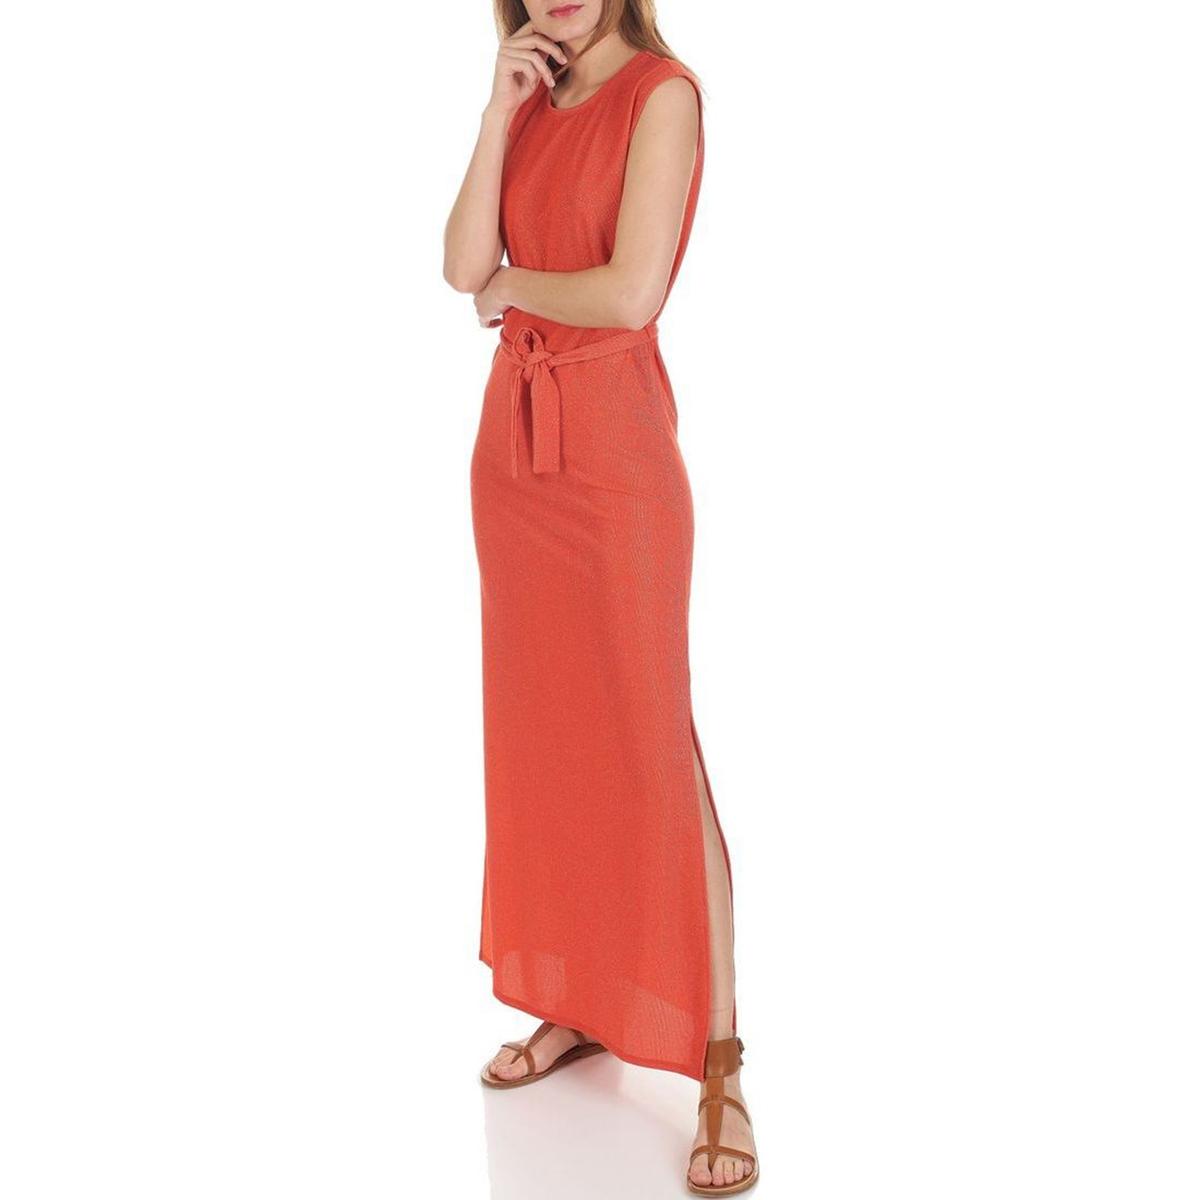 Платье длинное из блестящего трикотажа, без рукавов hawk hkaw 128 1